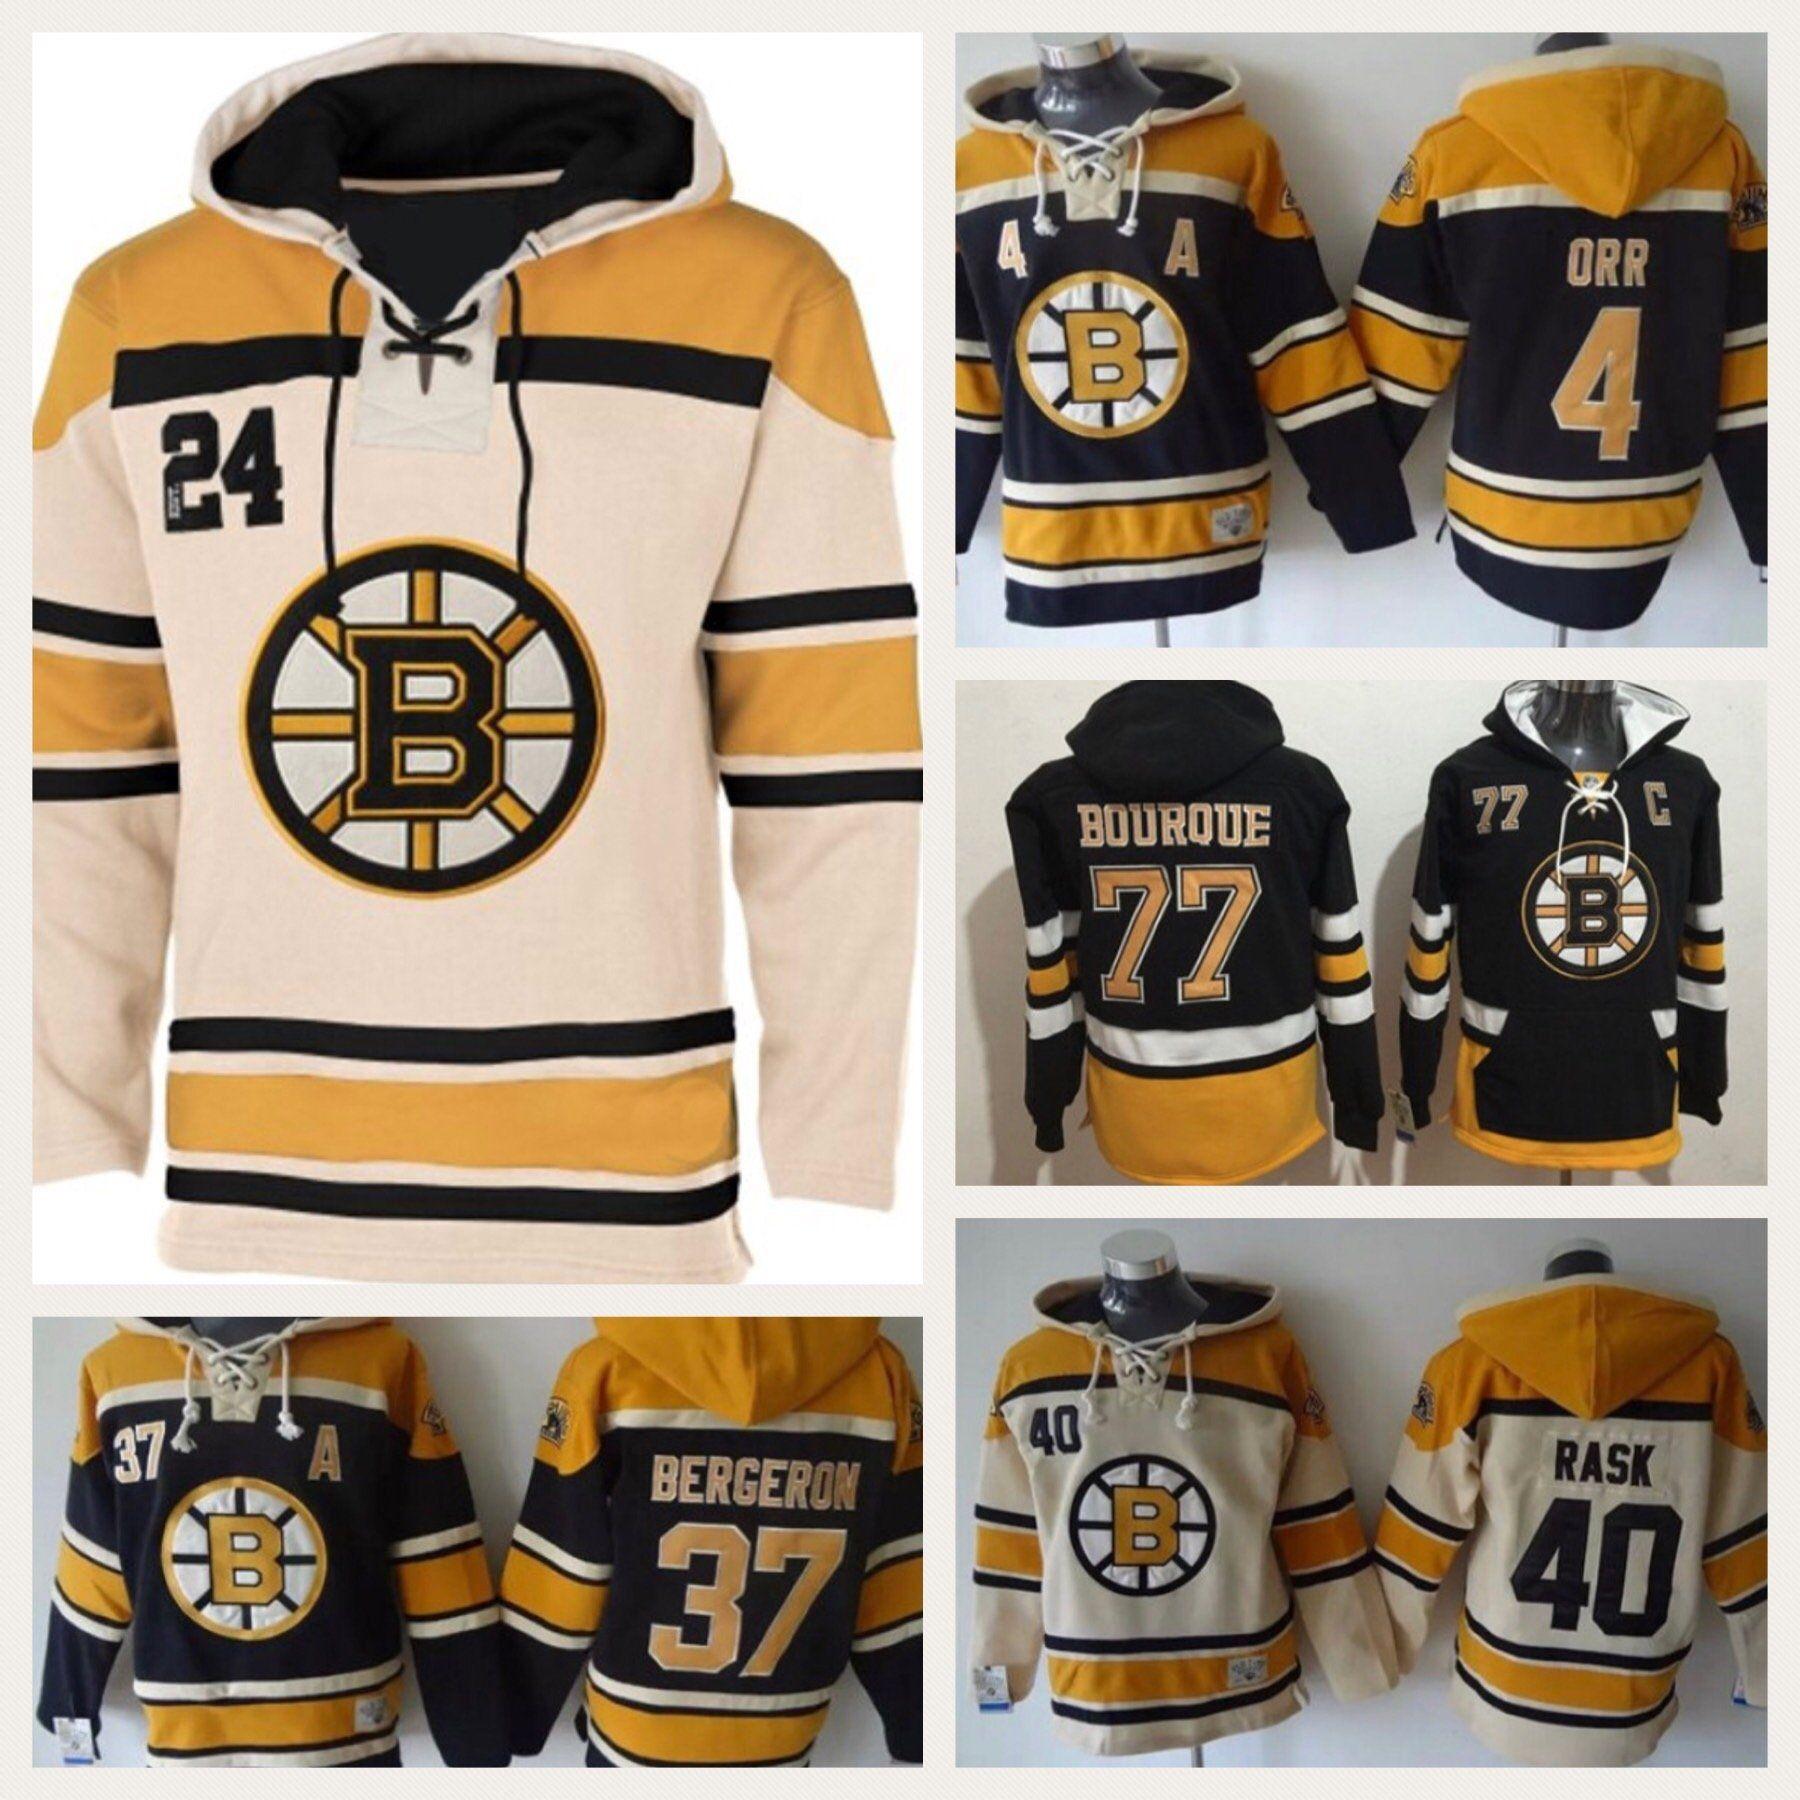 Boston Bruins NHL Hockey Team Apparel Hoodies  b963dbf7d